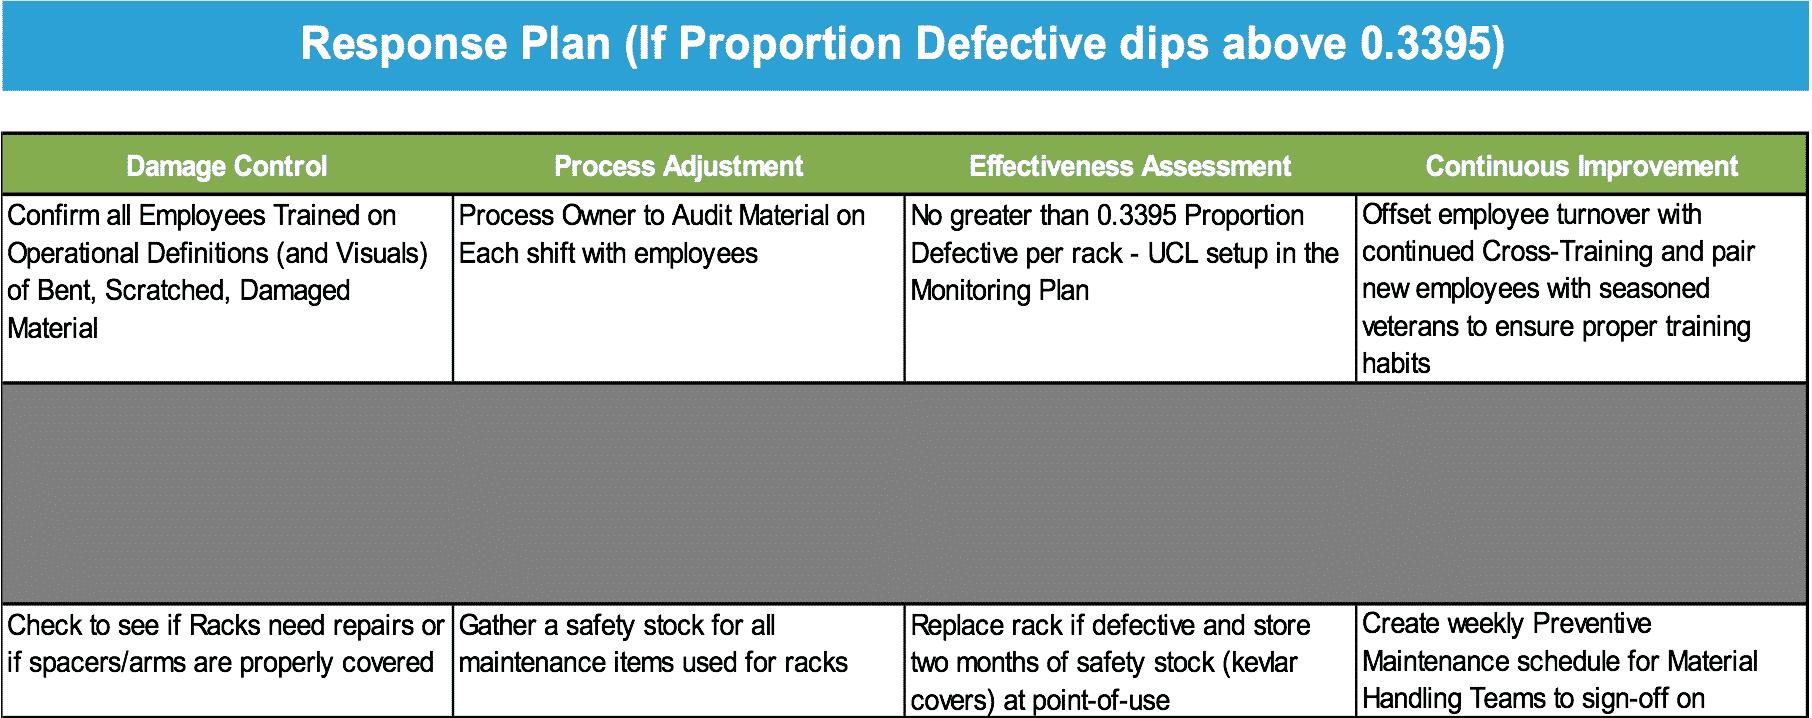 Response Plan - BSD Project